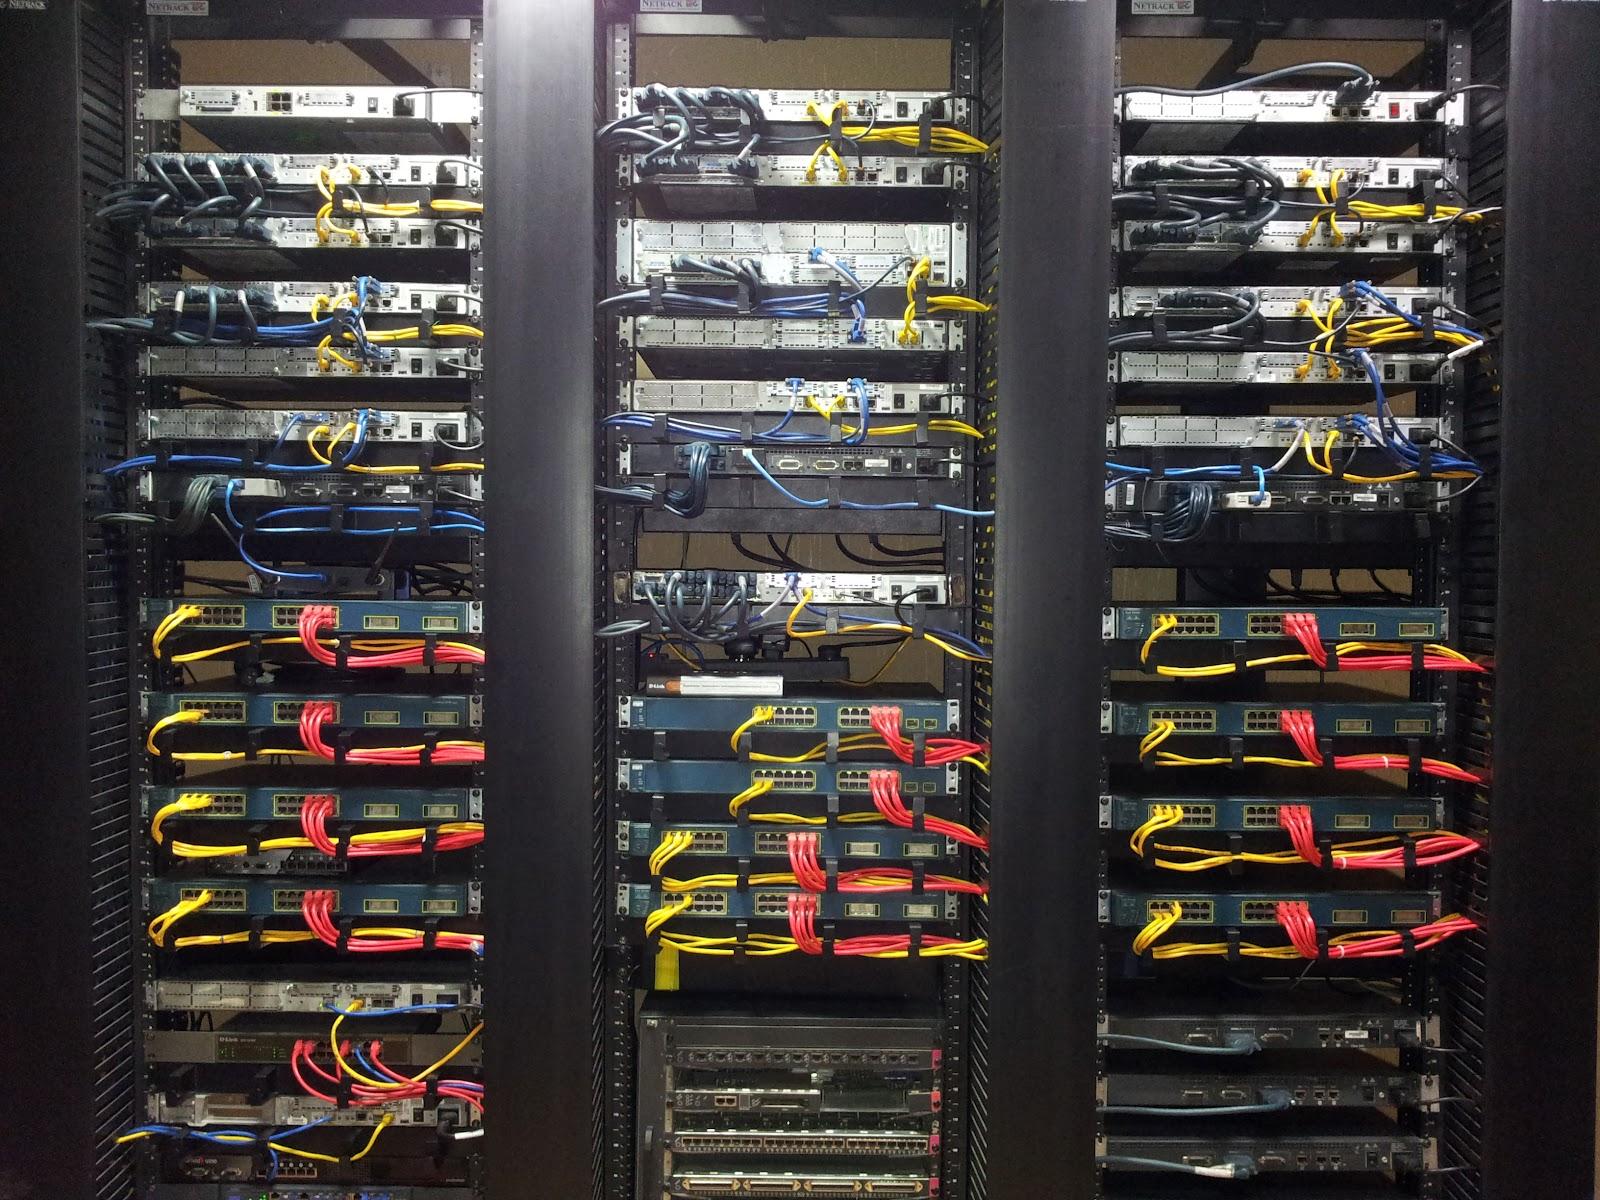 Cisco networking academy wallpaper